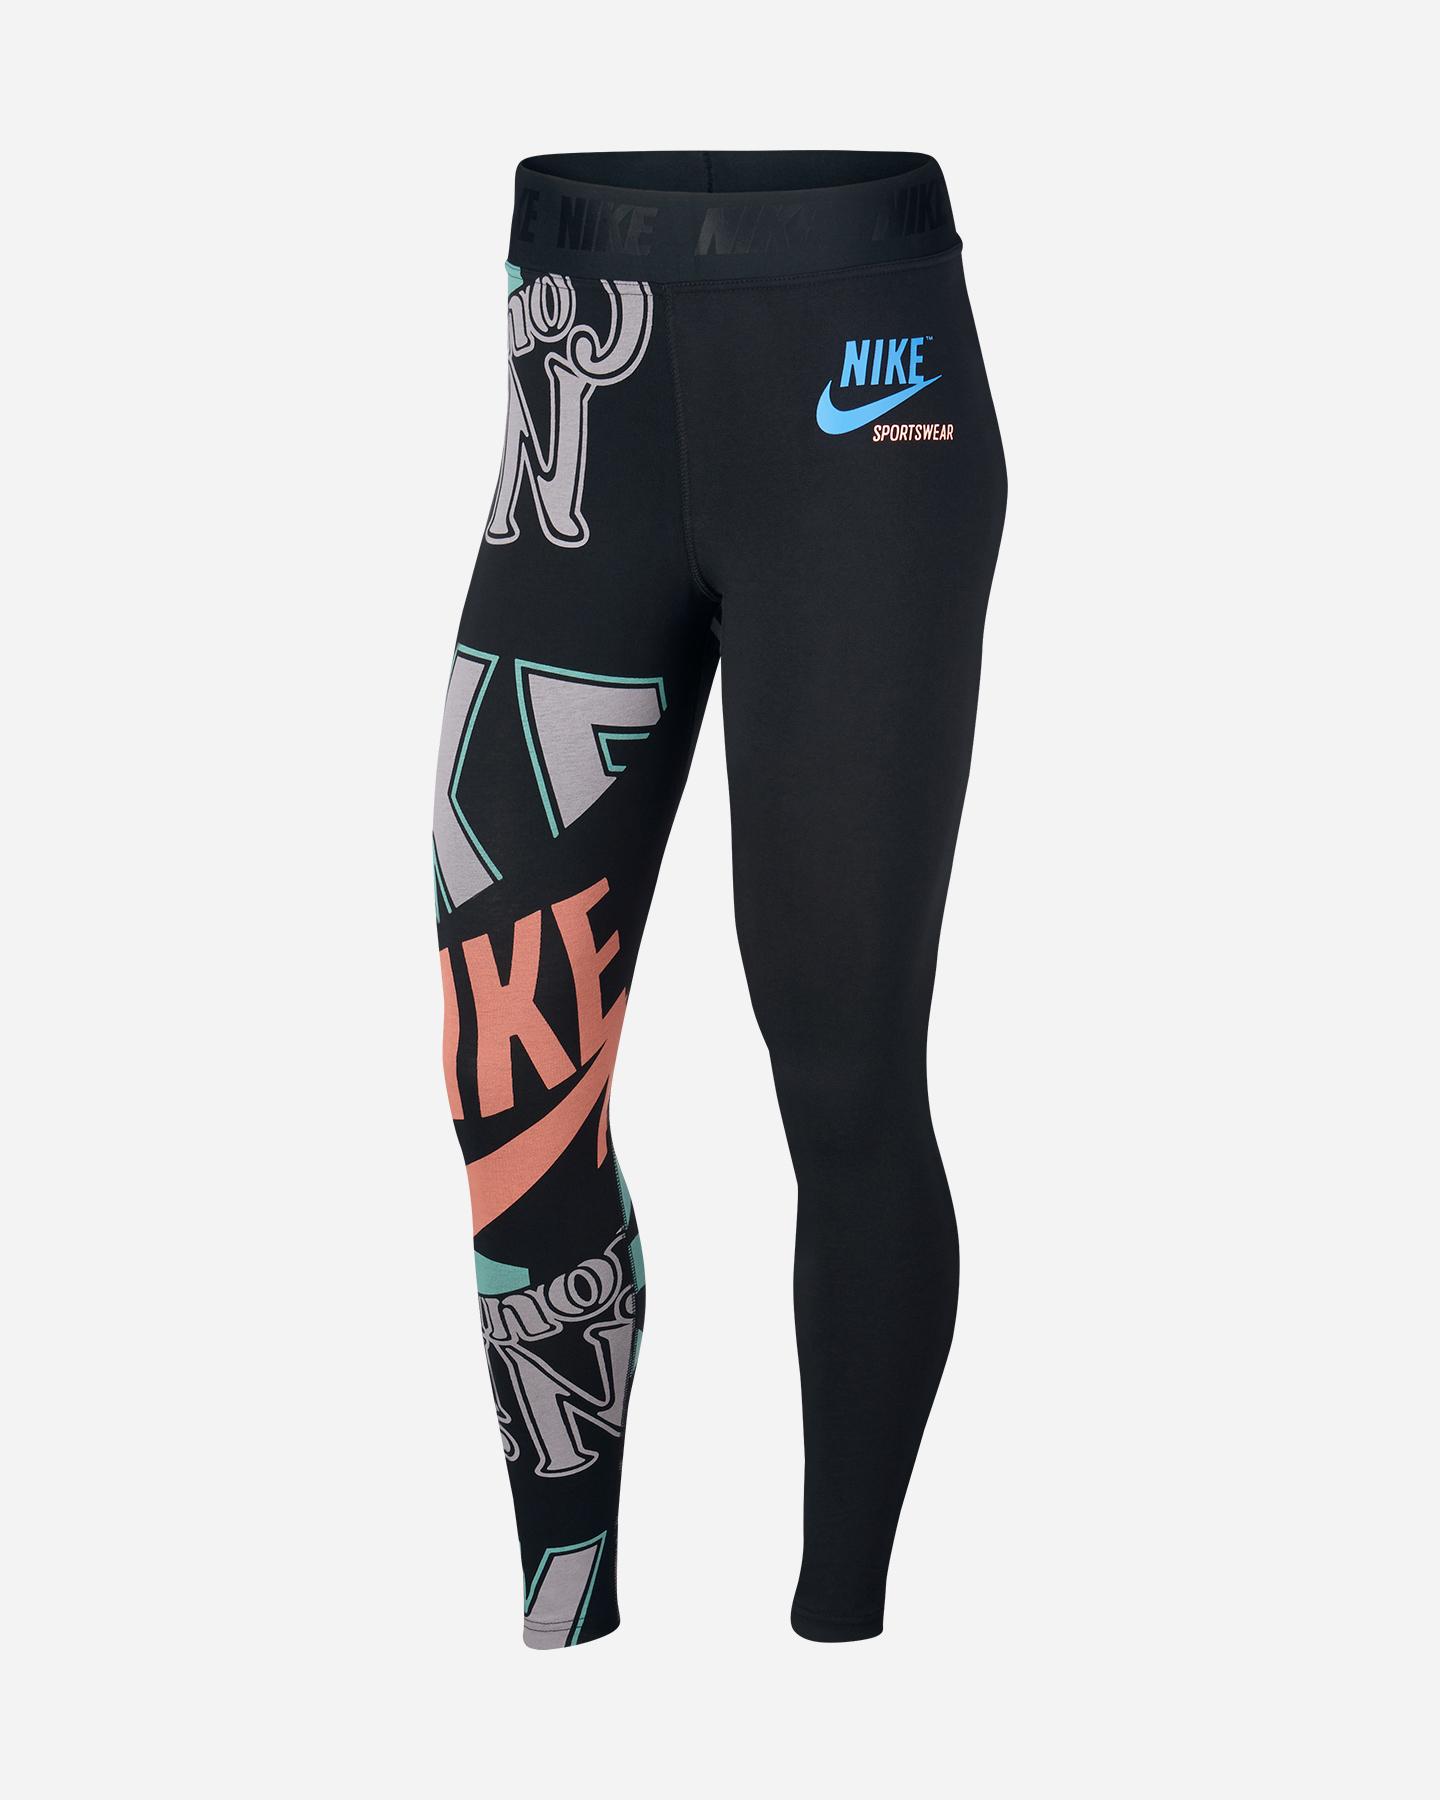 nike donna leggings crossfit  Nike Sportswear Idj W AQ3586-010   Leggings su Cisalfa Sport